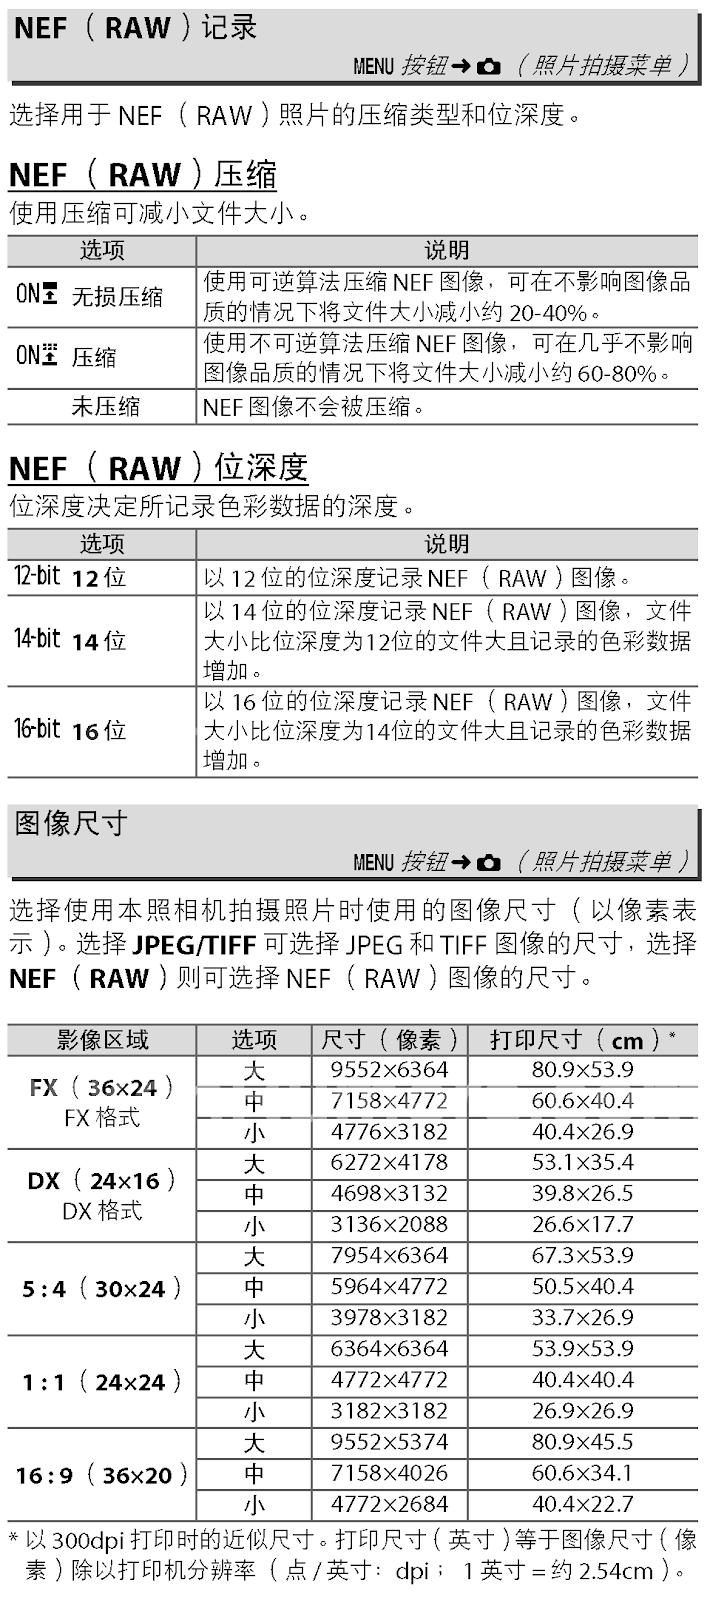 Таблица с характеристиками фотоаппарата Nikon из инструкции